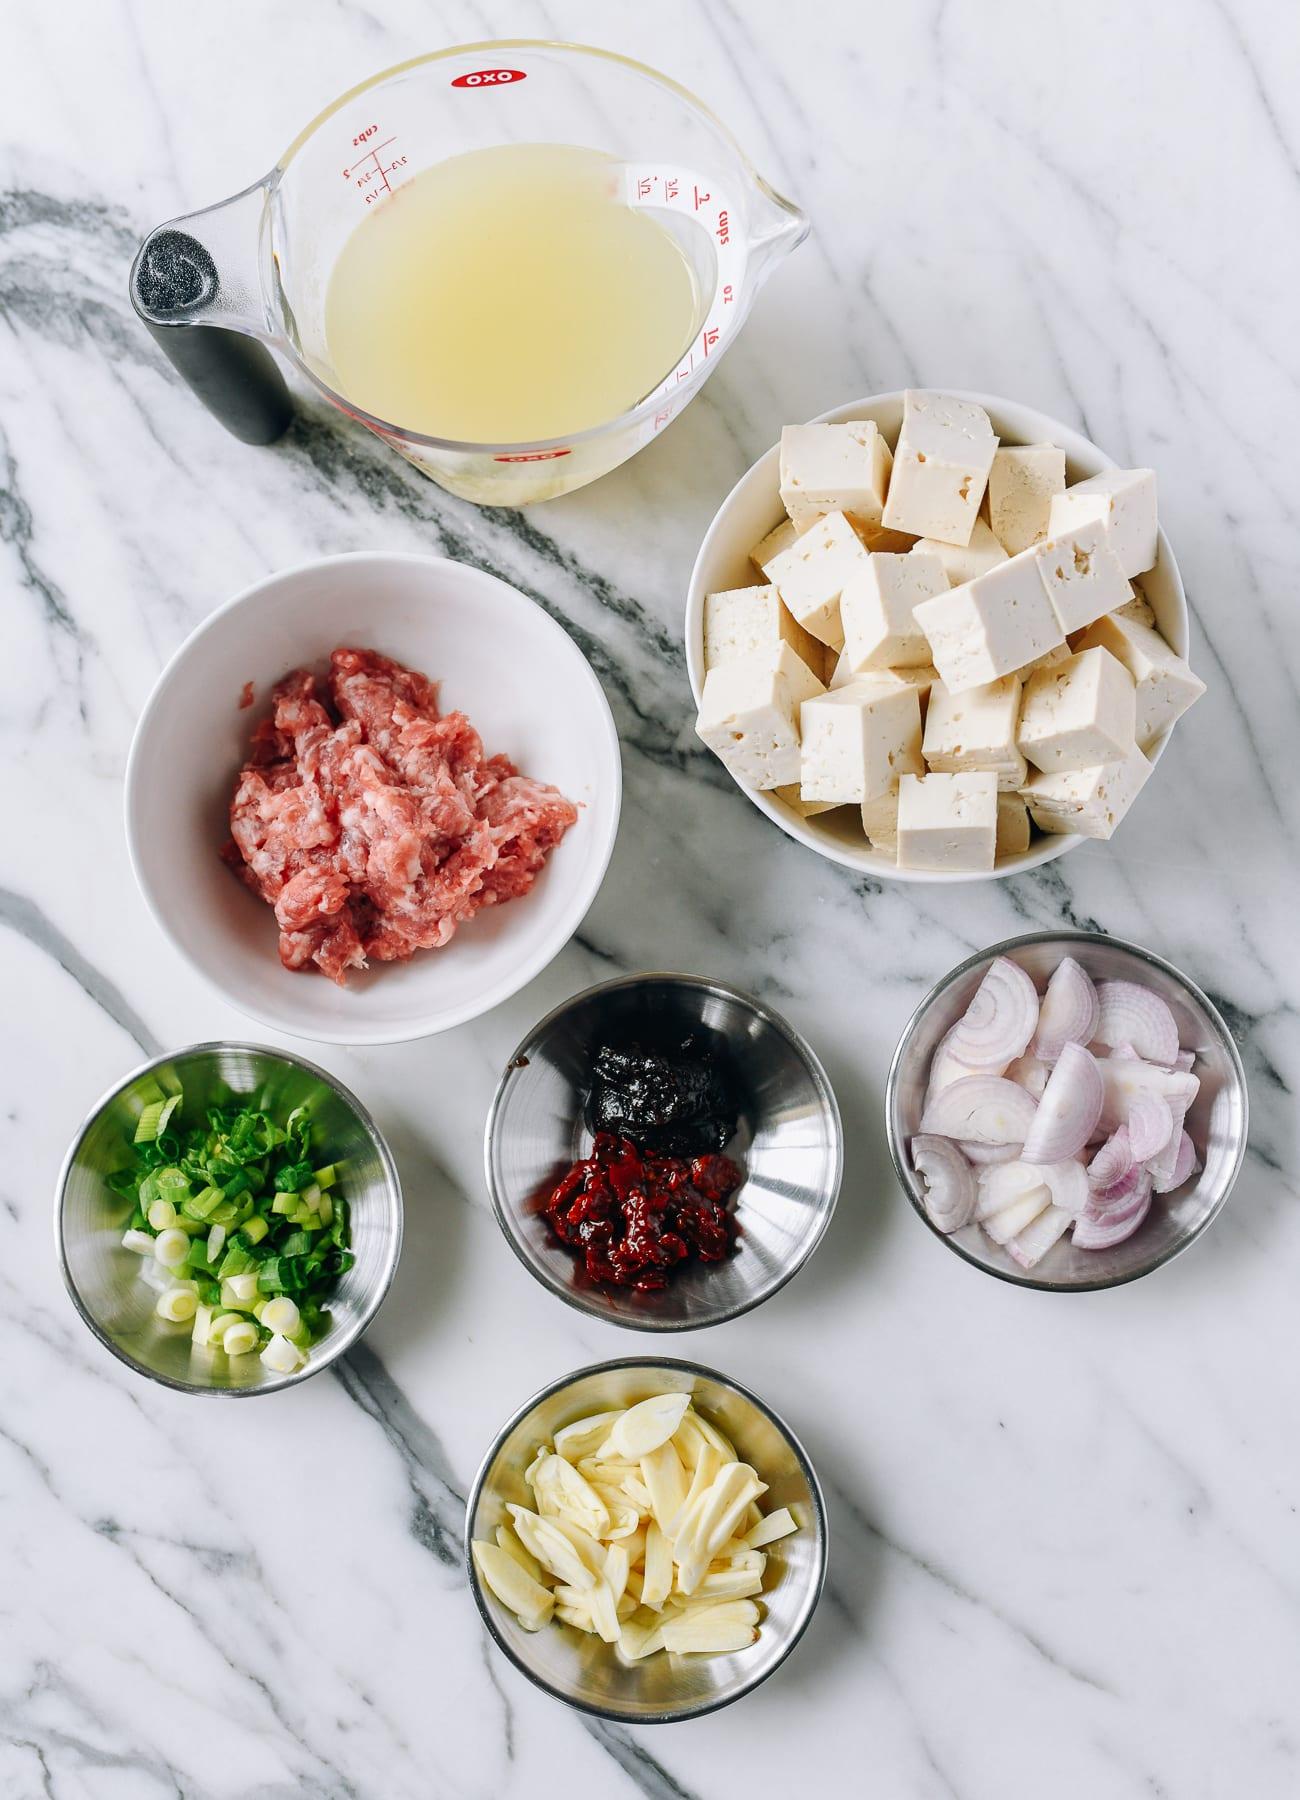 Ingredients for spicy garlic tofu